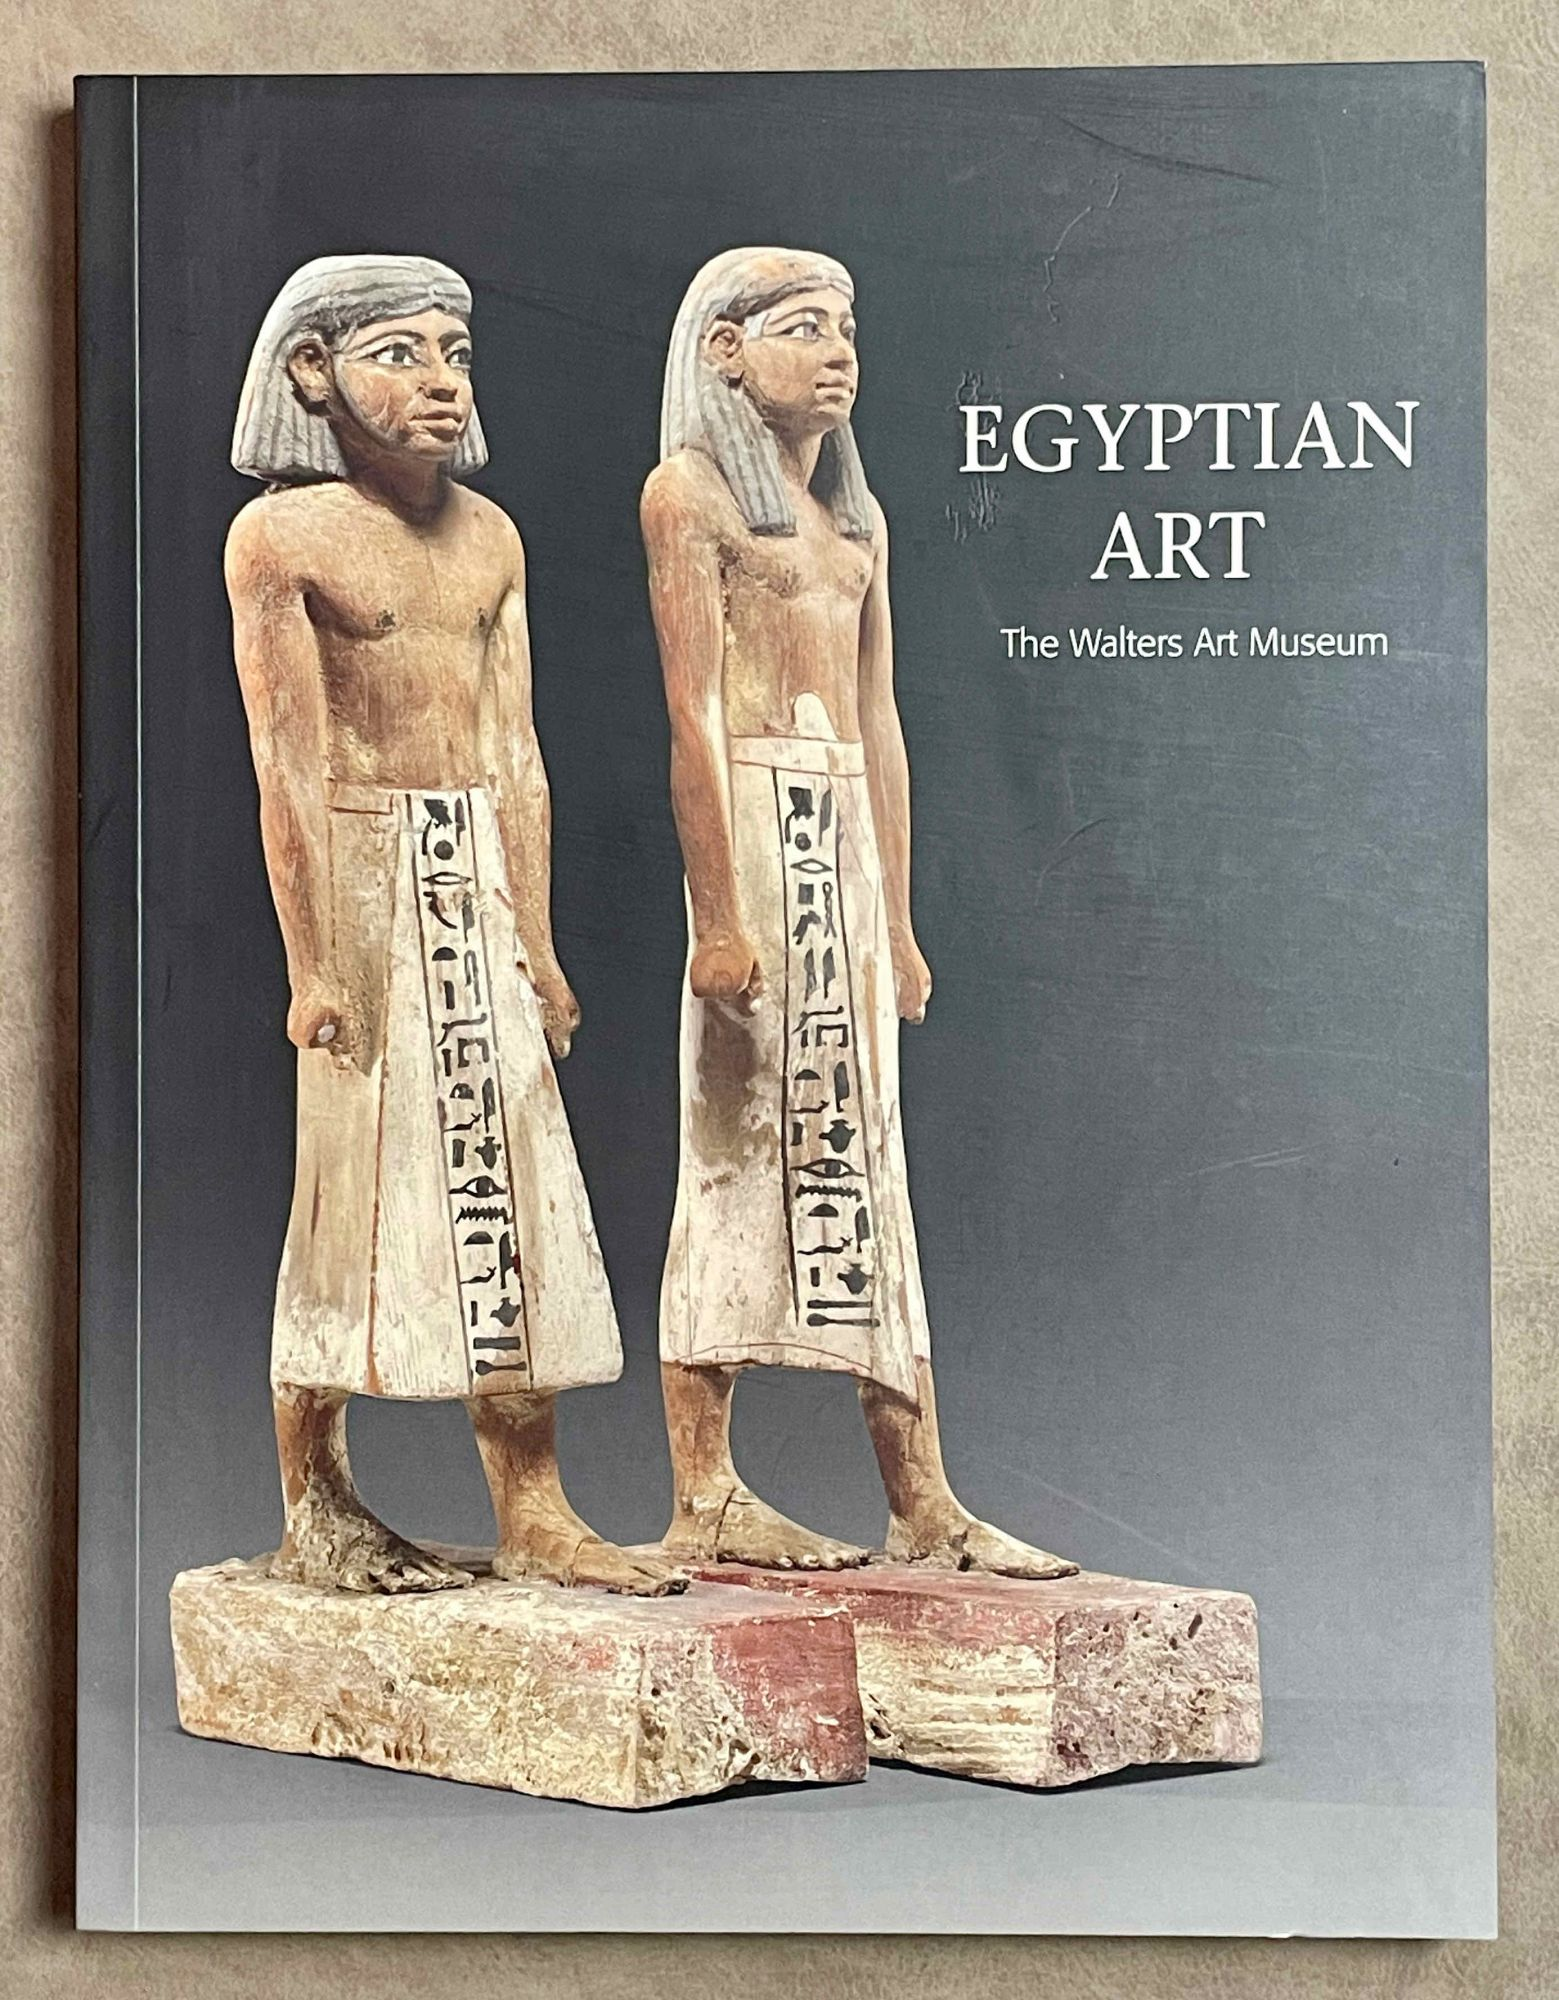 Egyptian Art - The Walters Art Museum